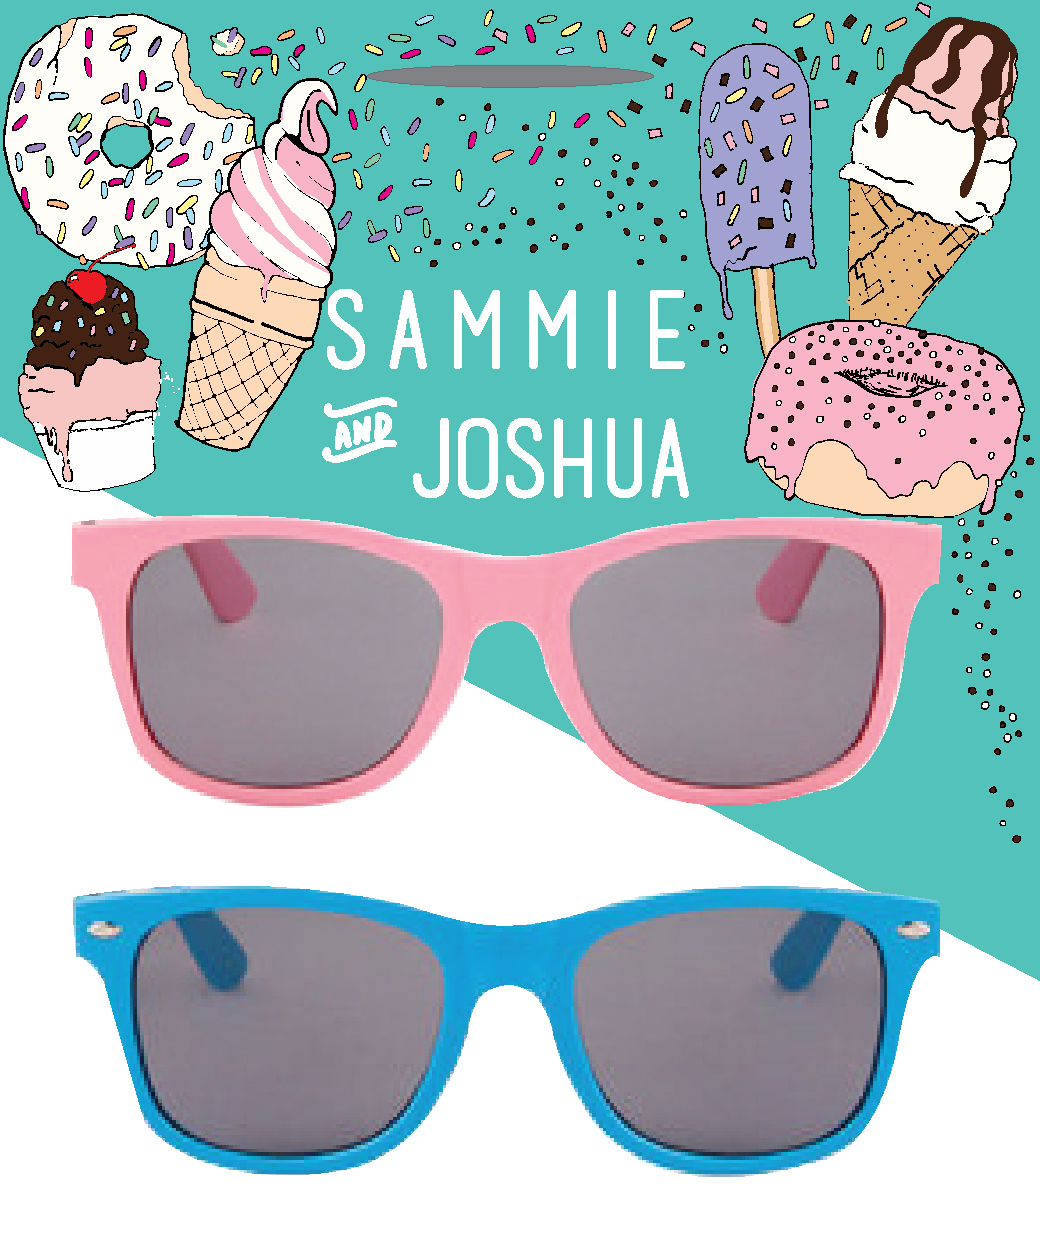 Sammie & Joshua 2 pack hangcard-GIRLS-01.jpg